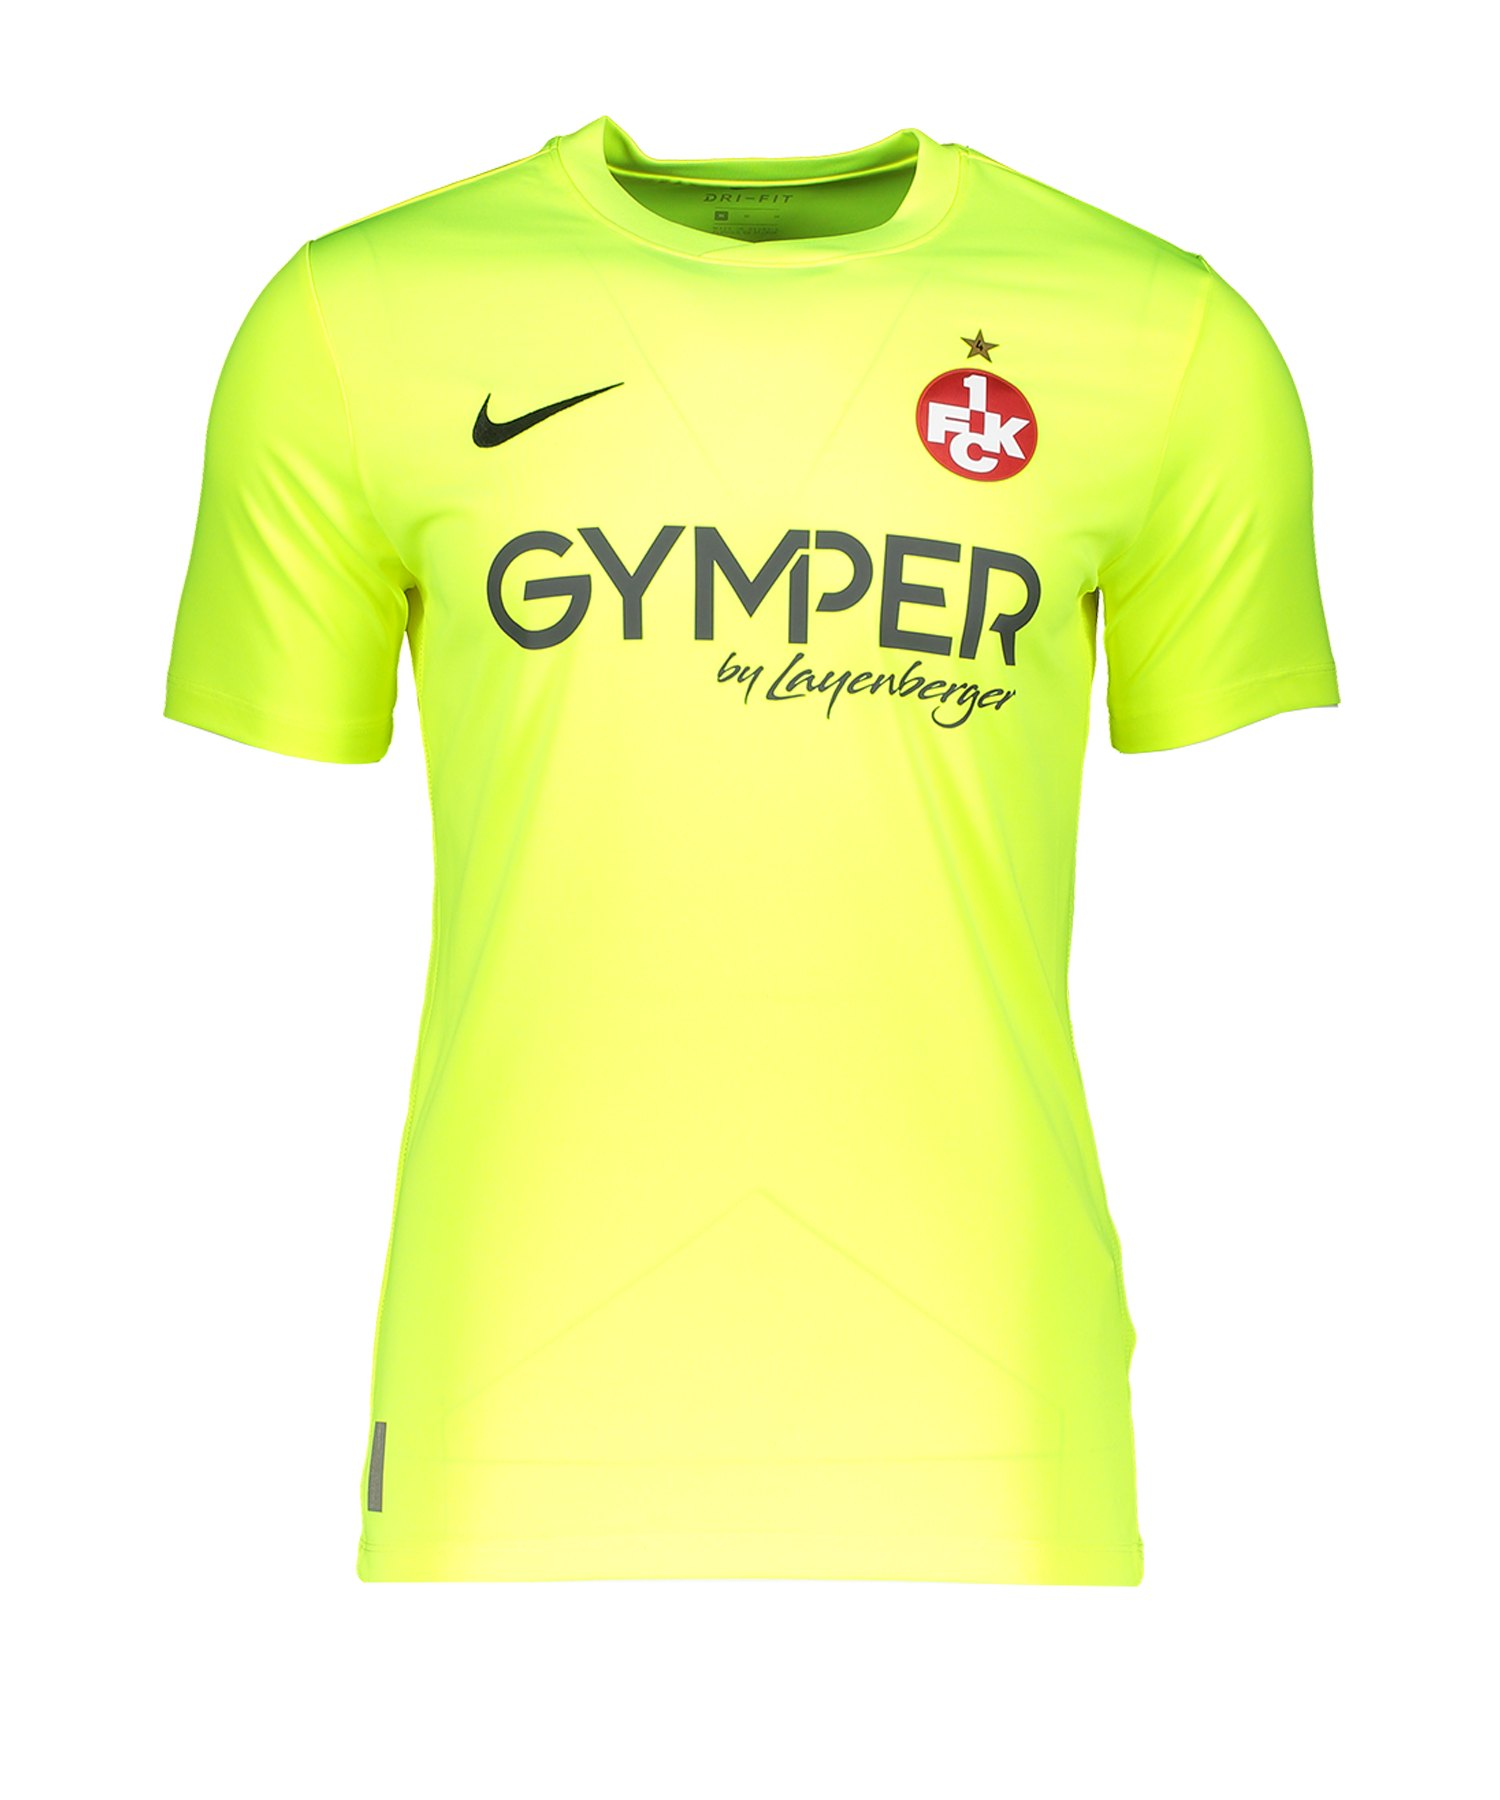 Nike 1. FC Kaiserslautern TW-Trikot 19/20 Kids F702 - gelb